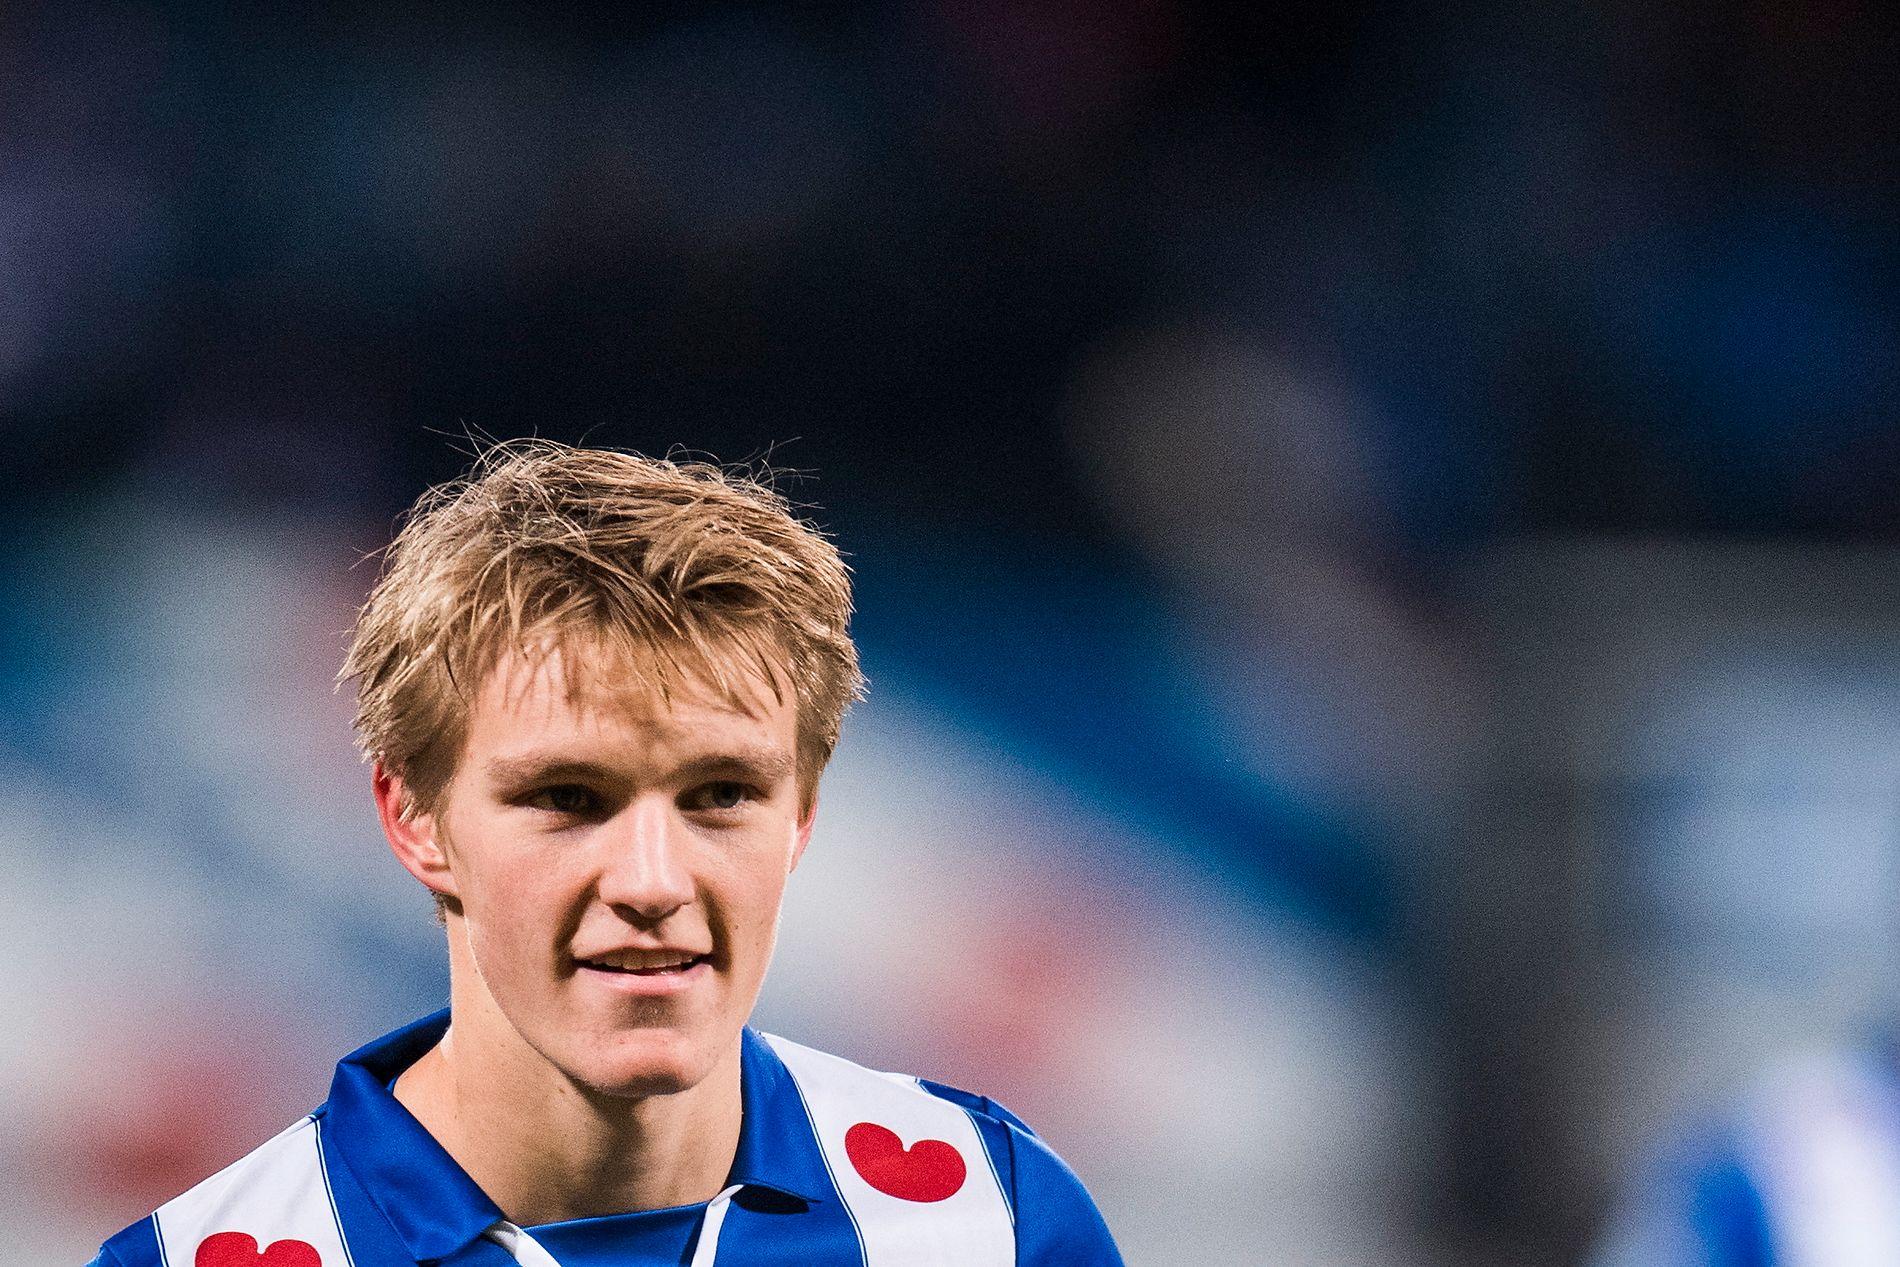 BLIR PÅ U21: Heerenveen-spiller Martin Ødegaard ble vraket på A-landslaget.